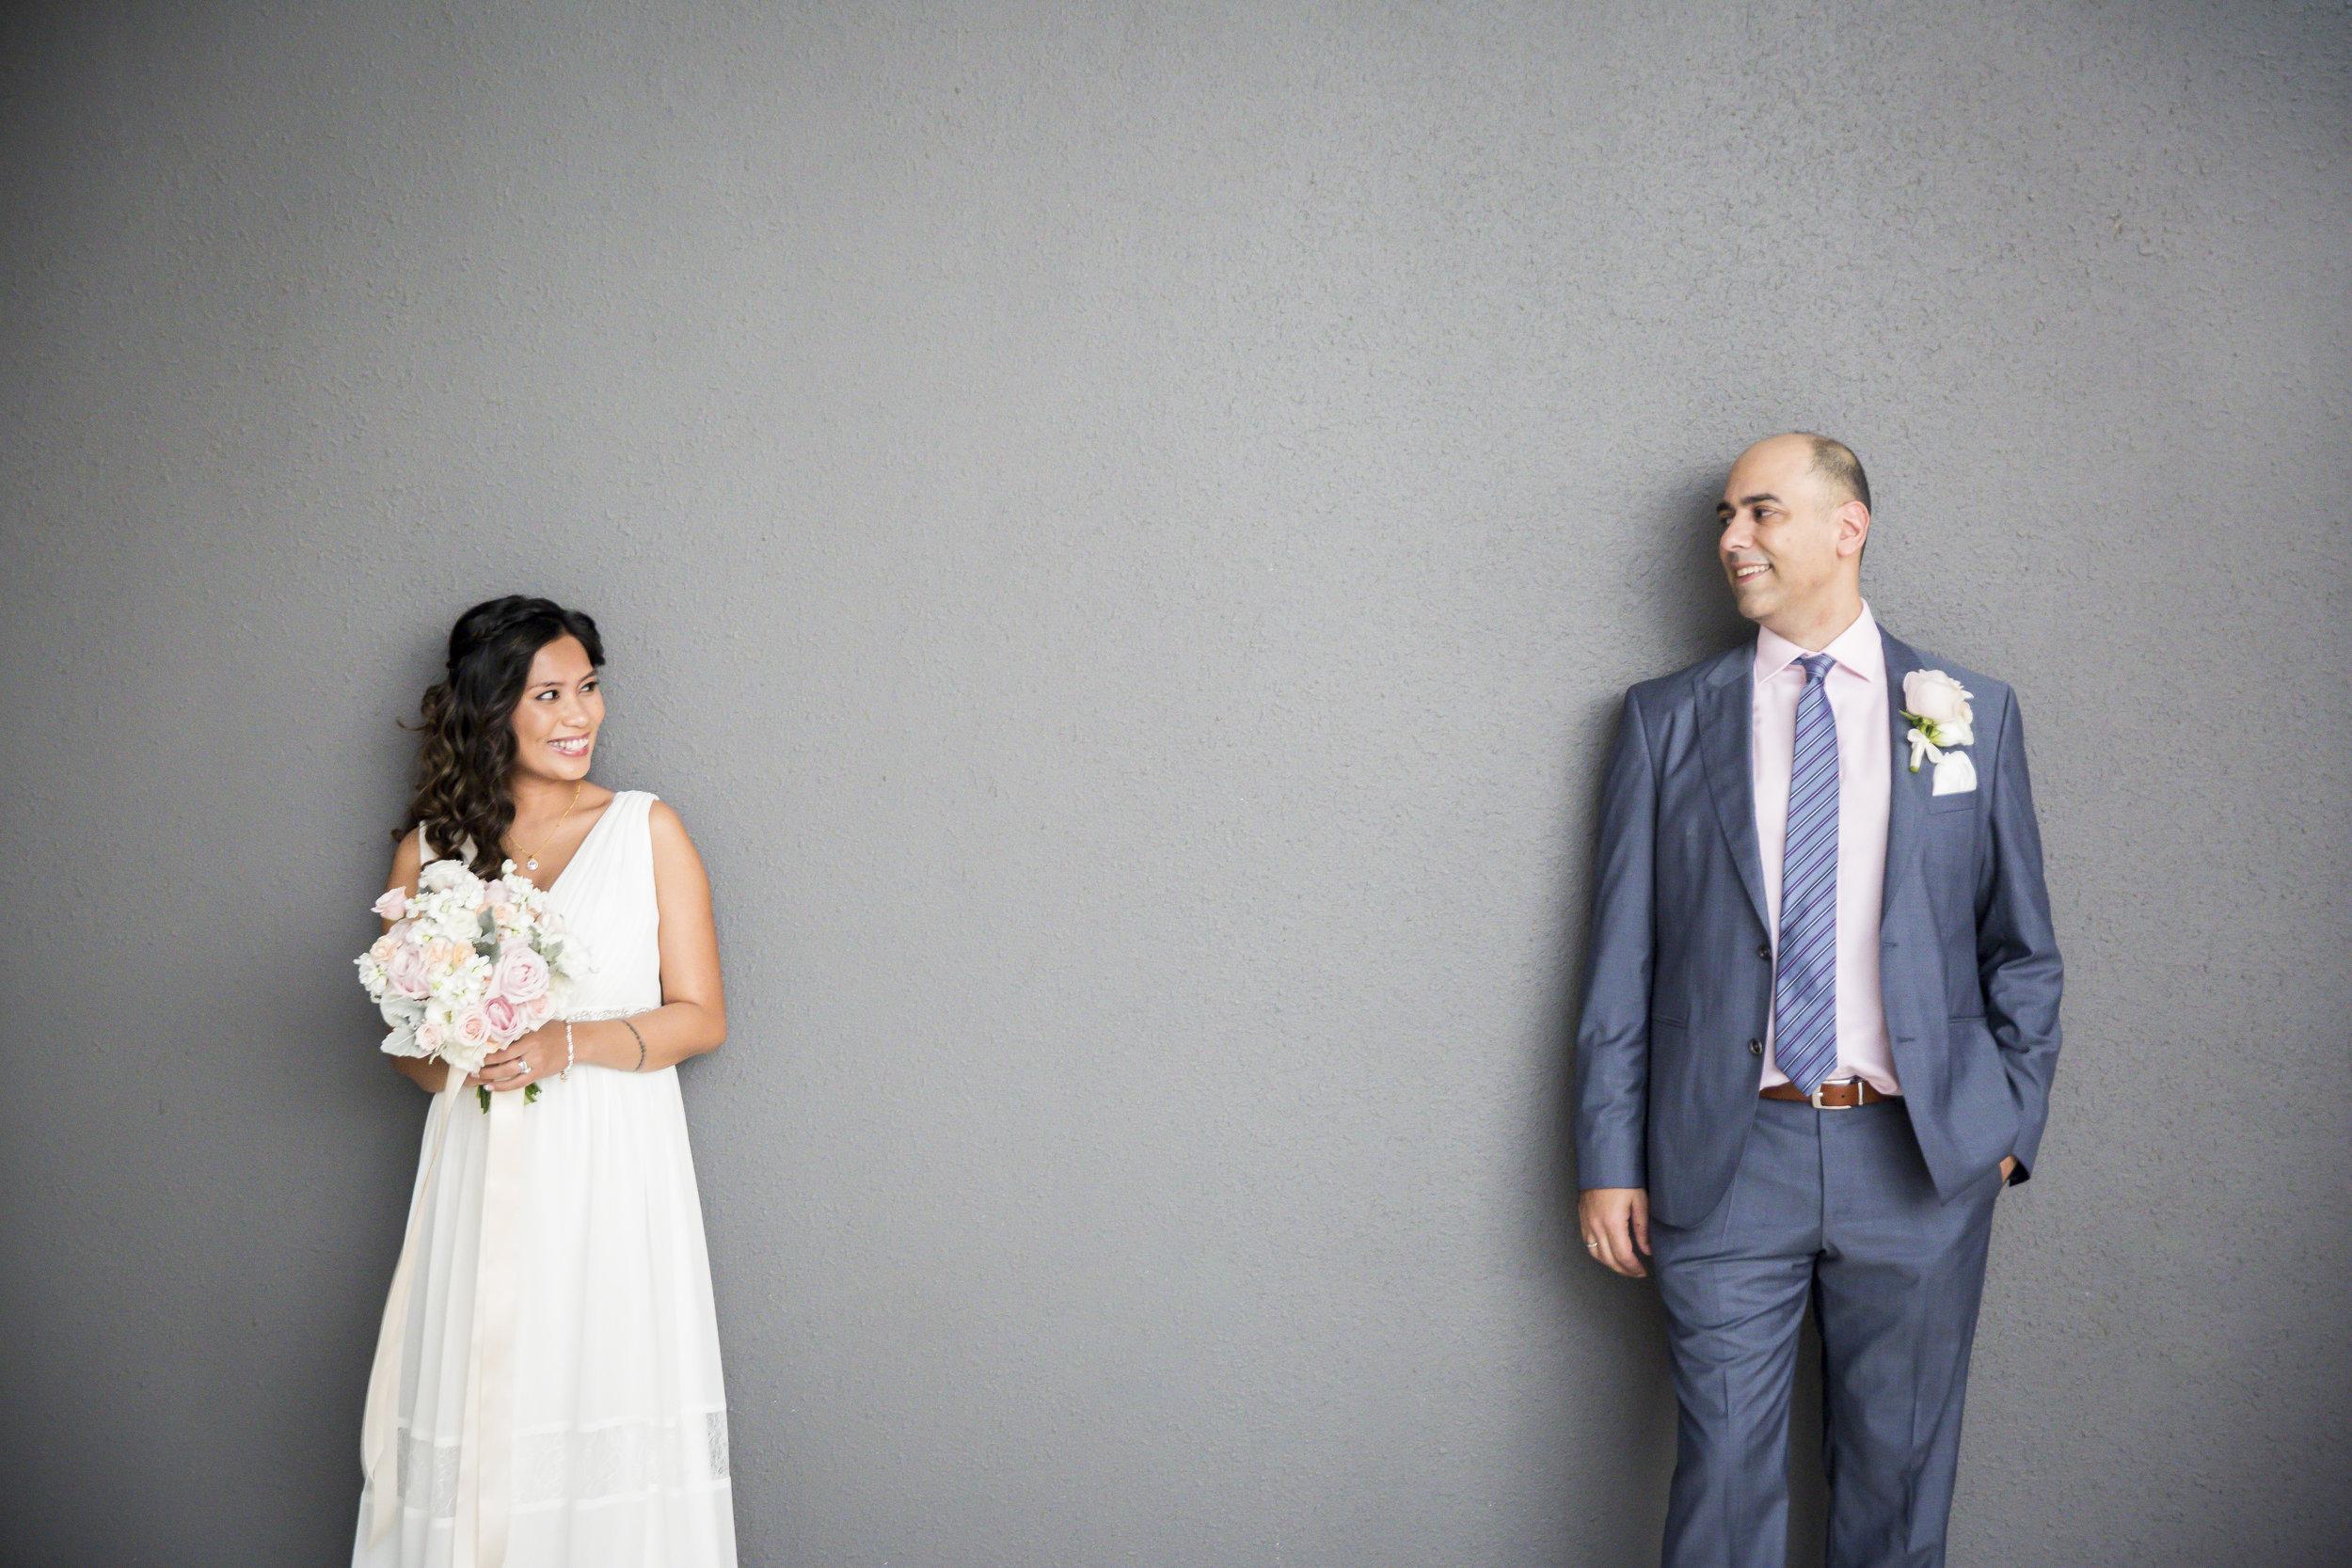 Wedding Photographer Singapore Vision Photography Daniel Parker Creative